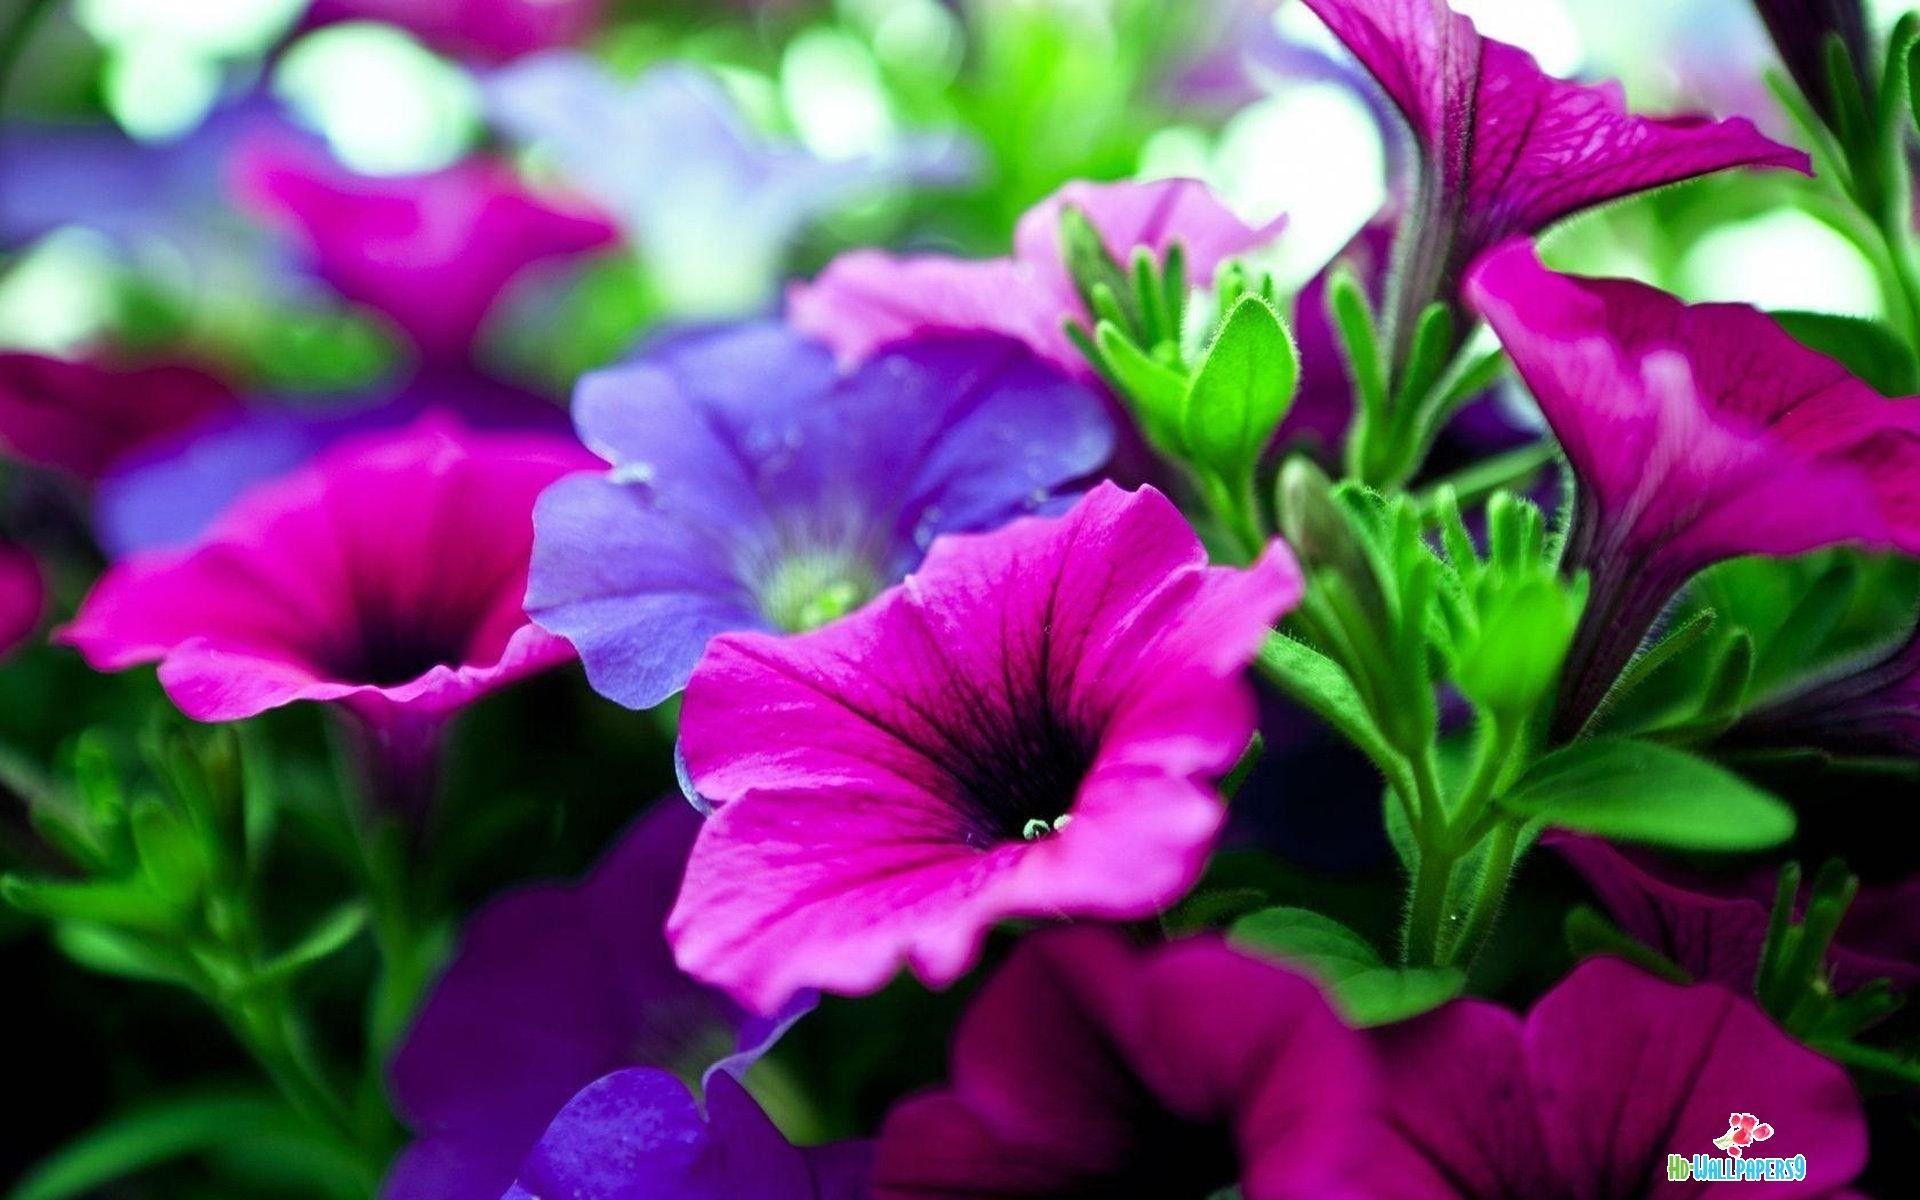 Desktop Wallpaper Flowers High Resolution - WallpaperSafari